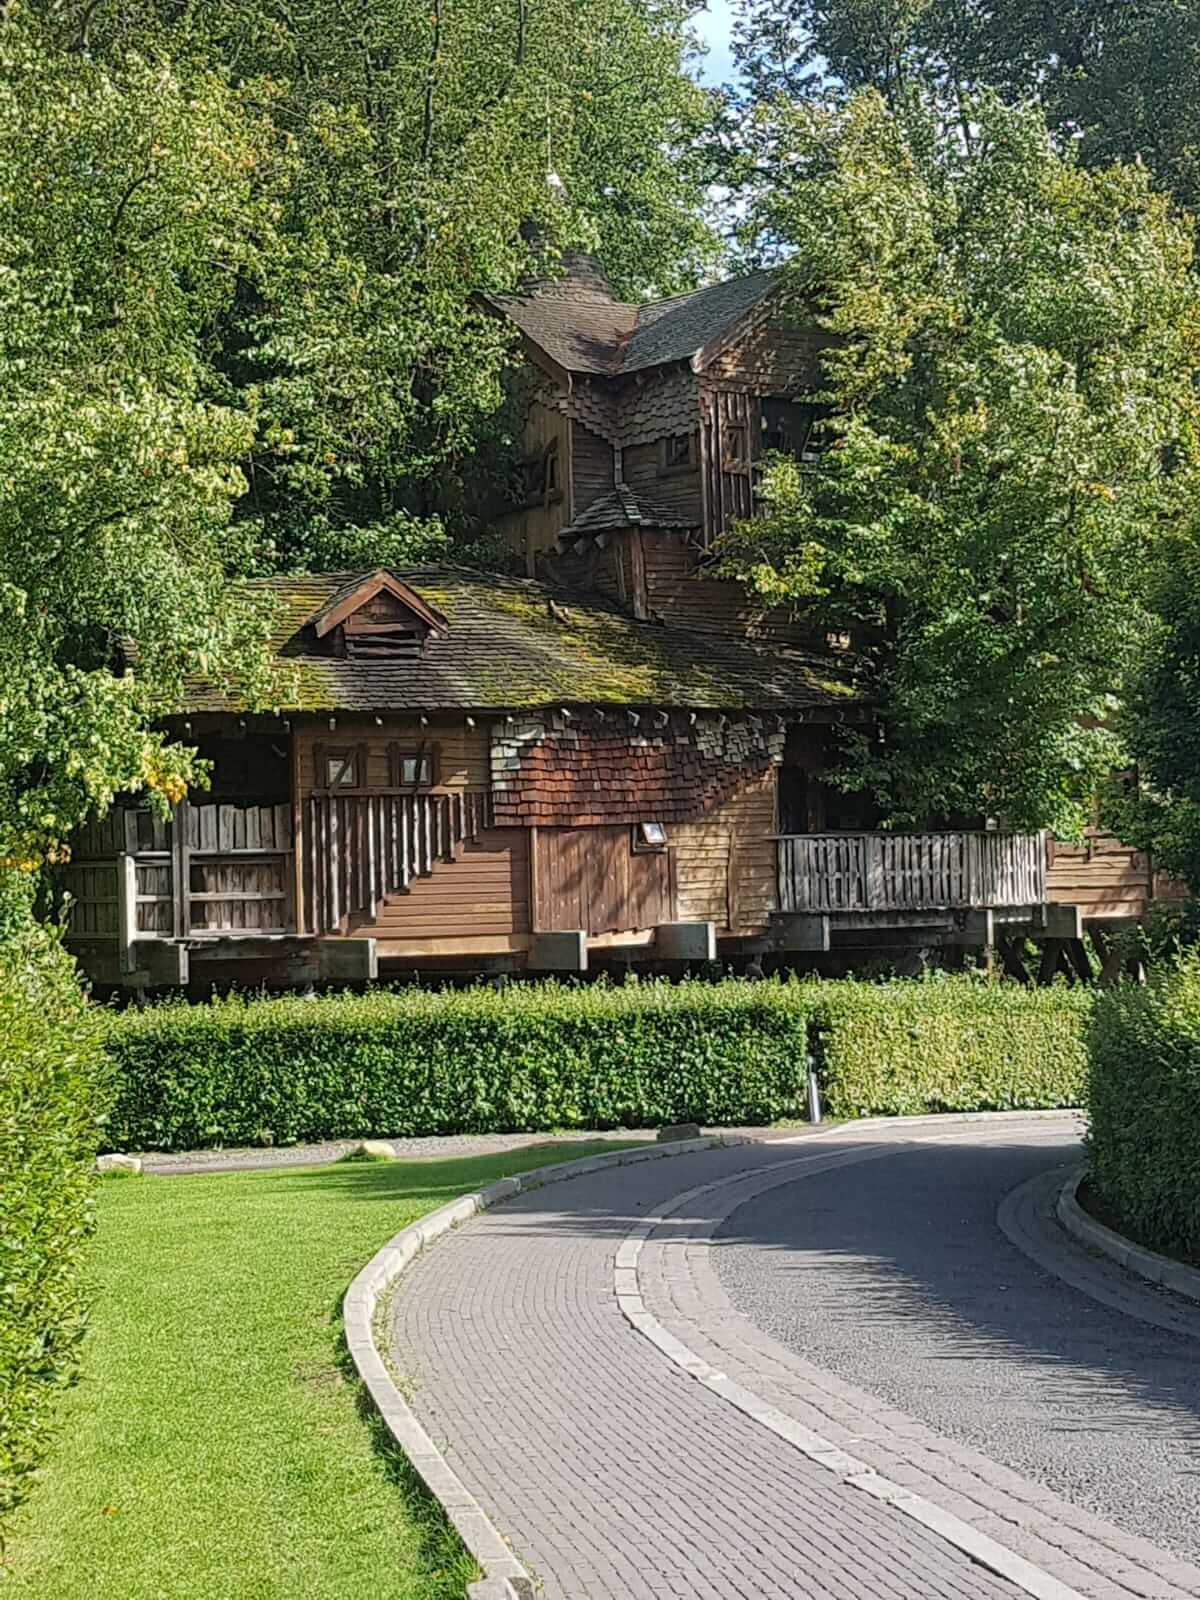 The Treehouse restaurant in Alnwick. Wedding venue in Alnwick.